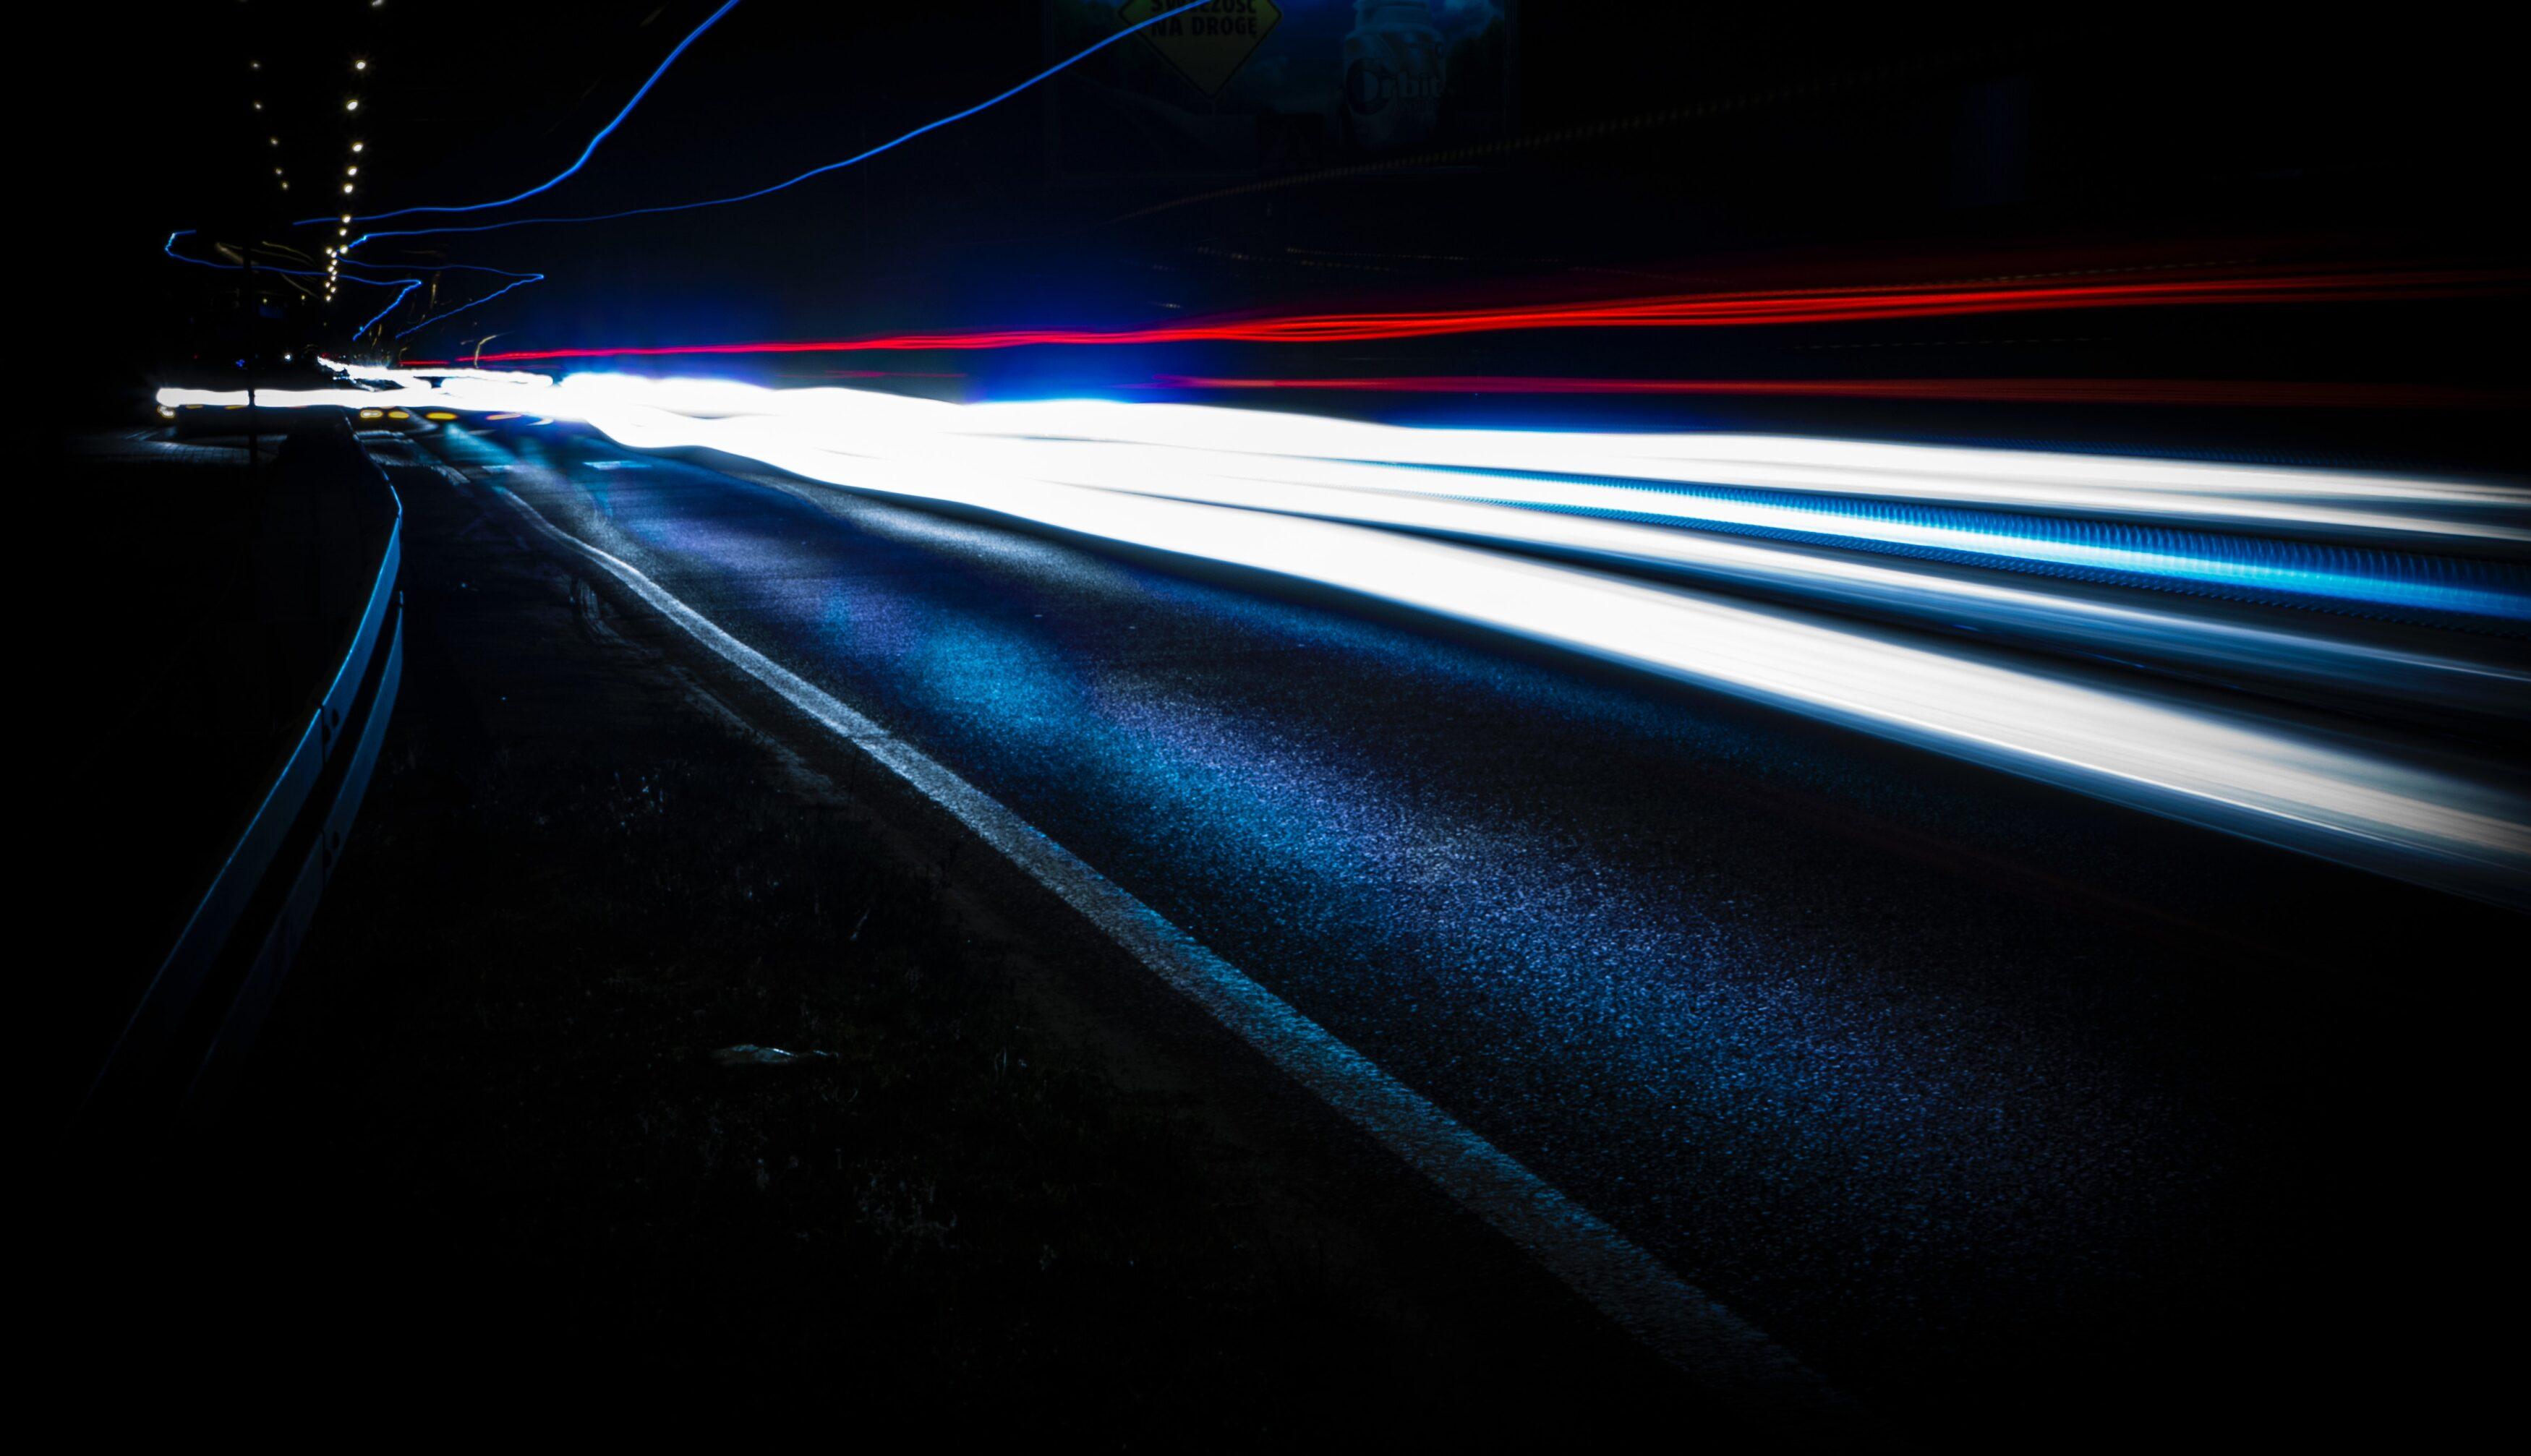 blur-cars-city-dark-409479